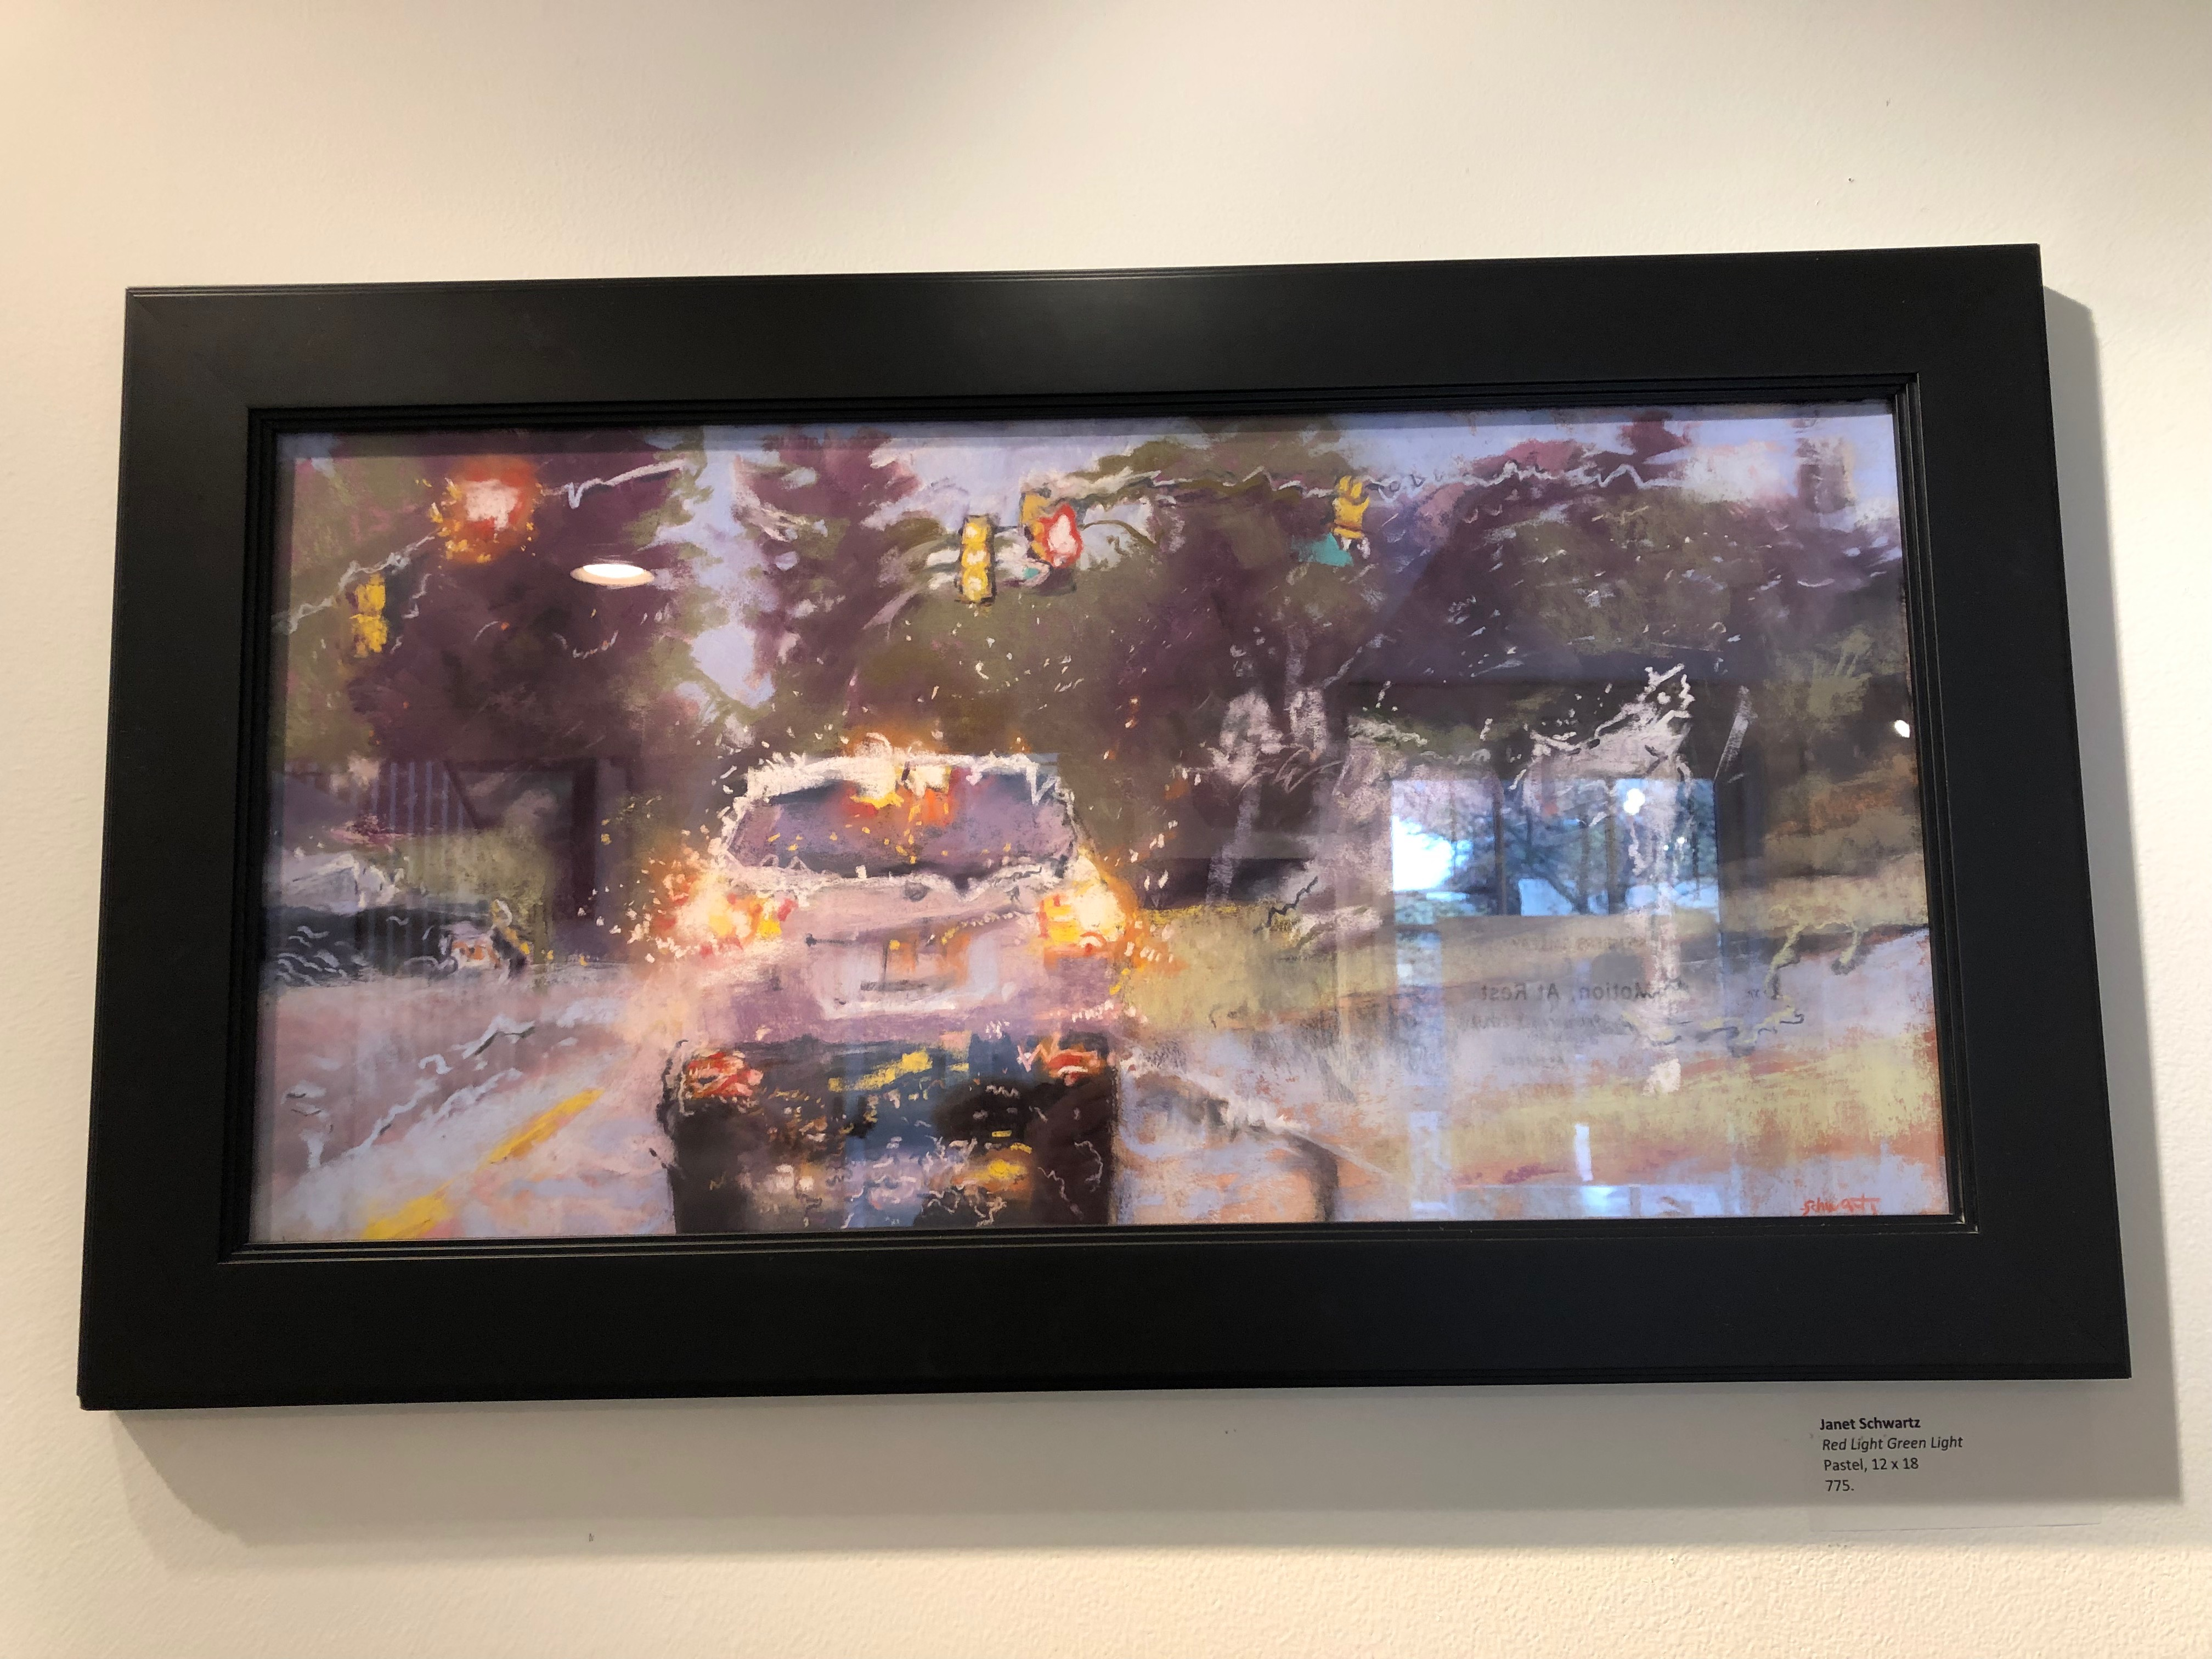 012719-Concord-Art-Janet-SchwartzJPG